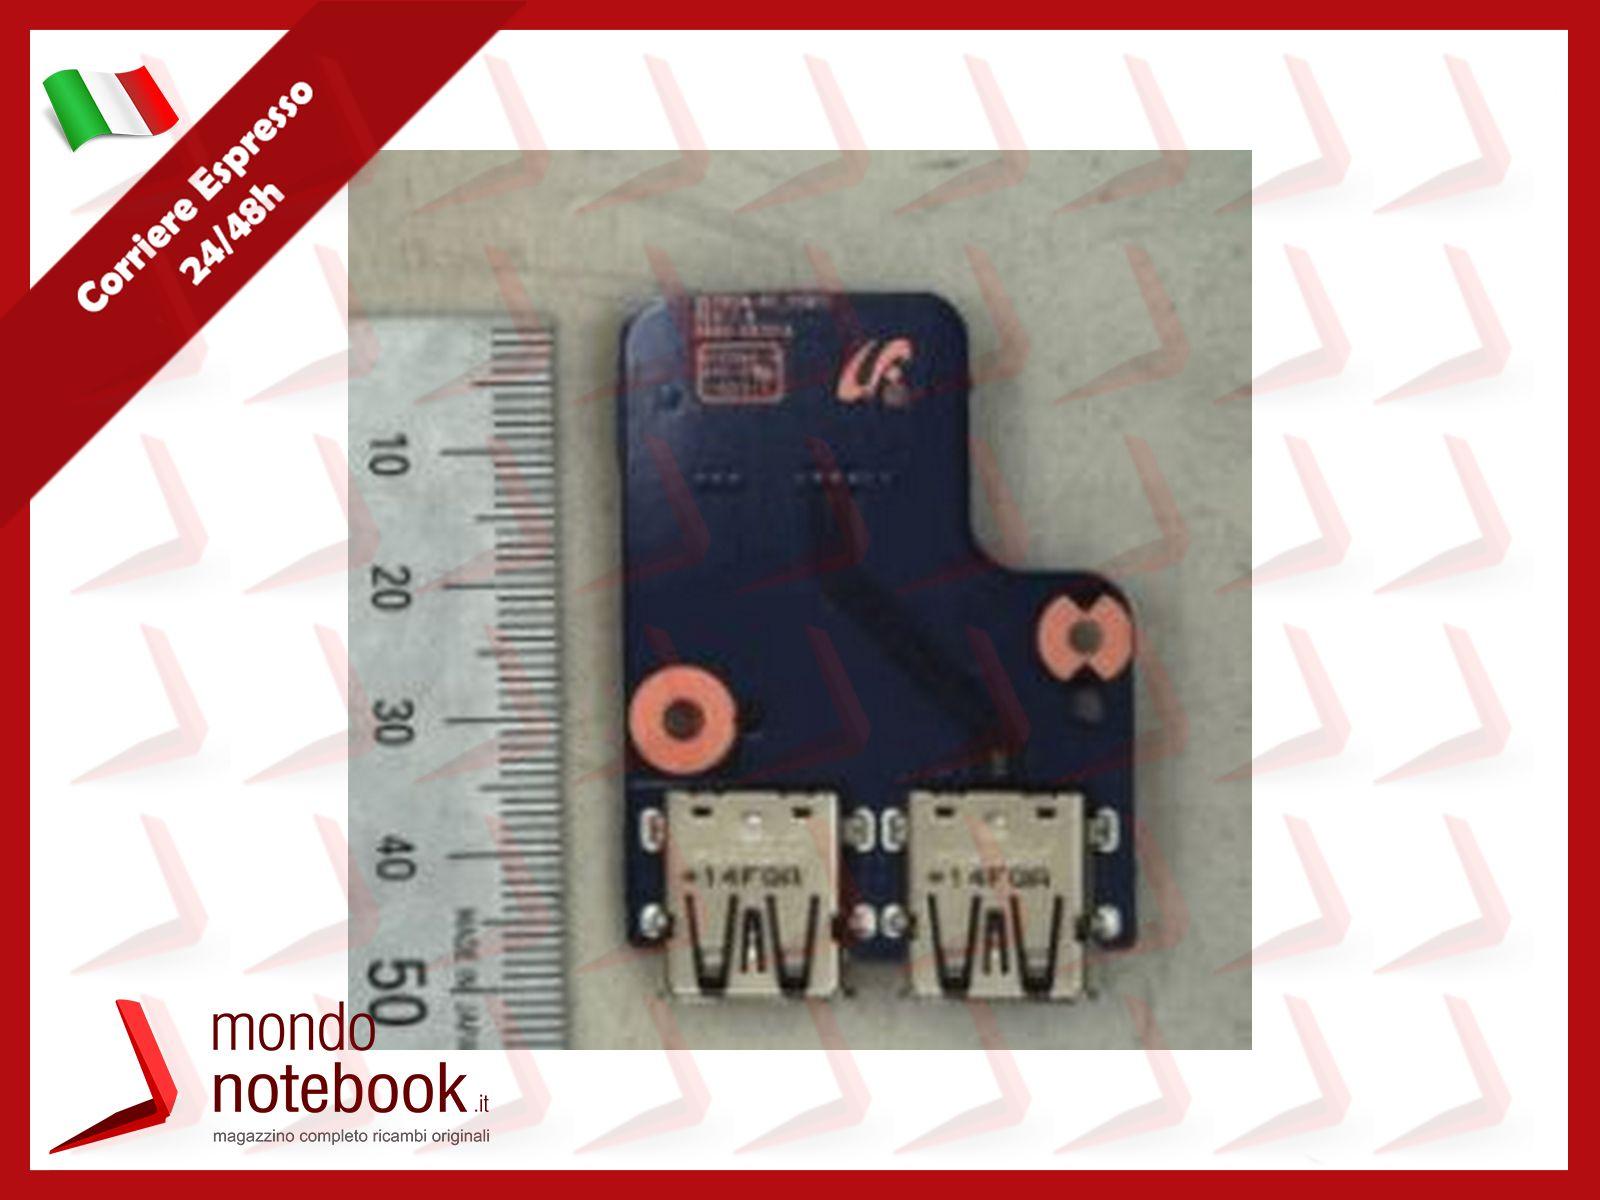 cerniere-hinges-hp-probook-650-g1-coppia